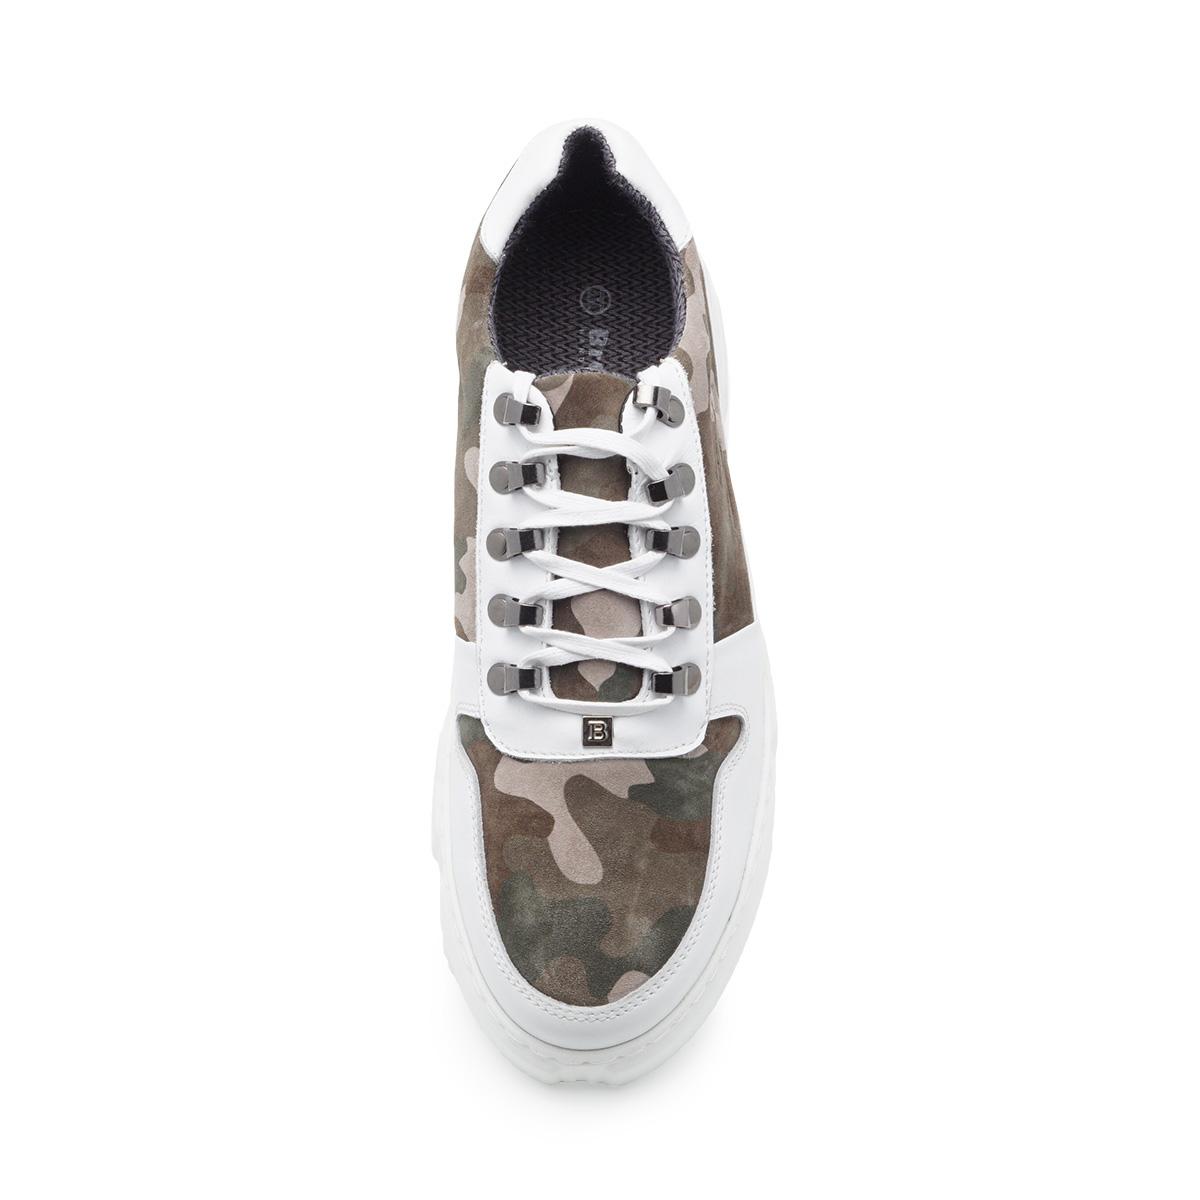 фотосъемка обуви в Харькове для  интернет-магазина LaModa